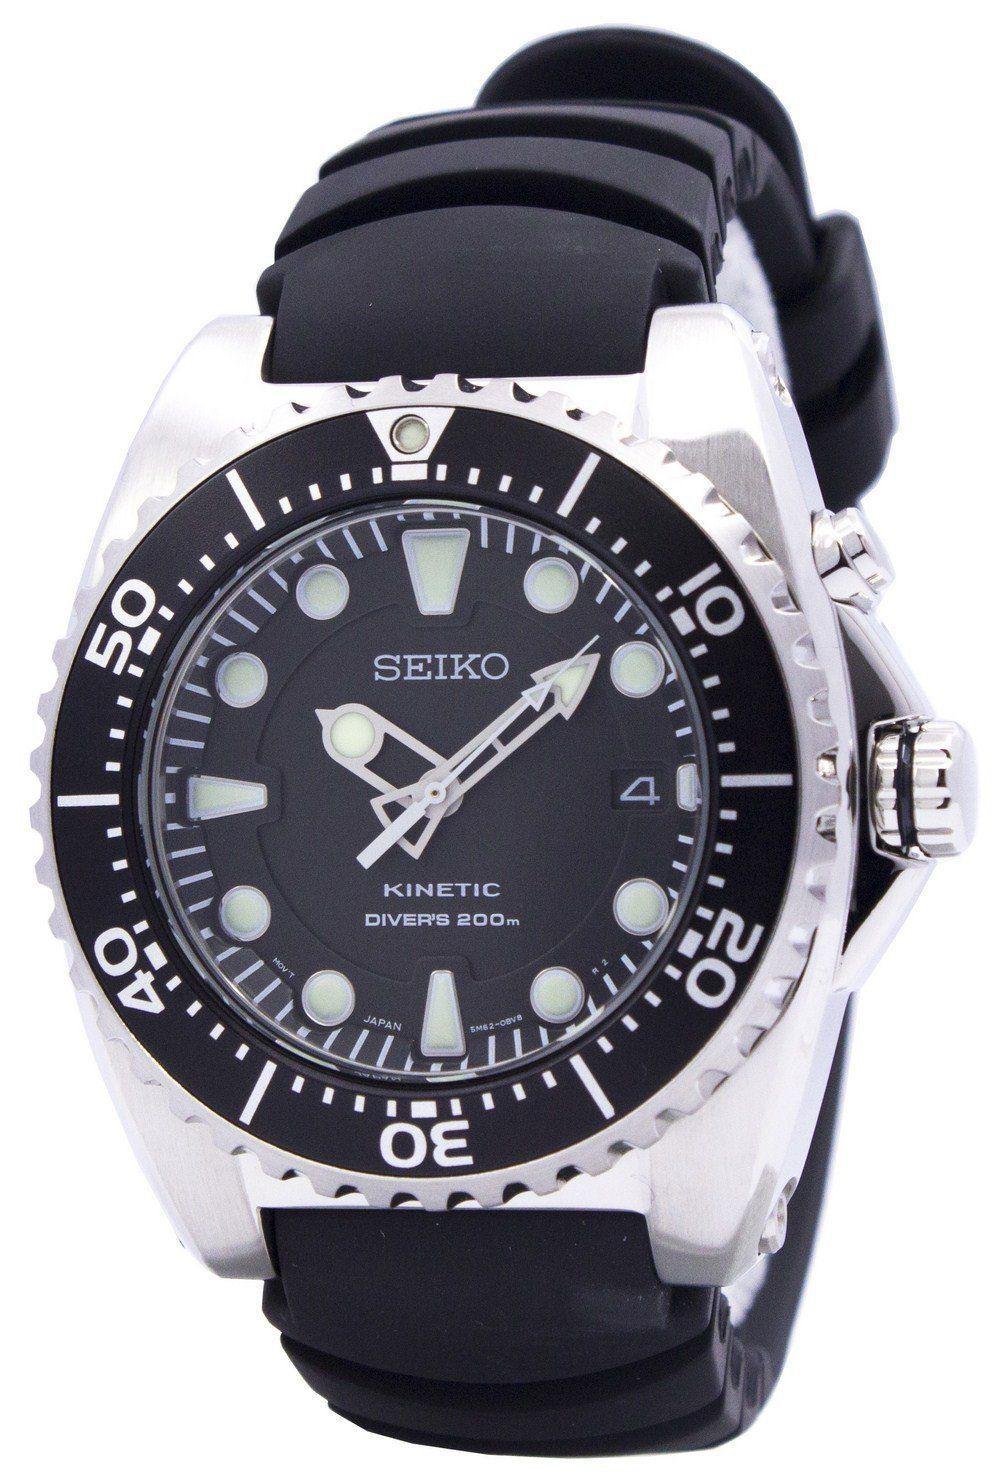 Seiko Divers Watch 200M Ska371P2 Mens Watch